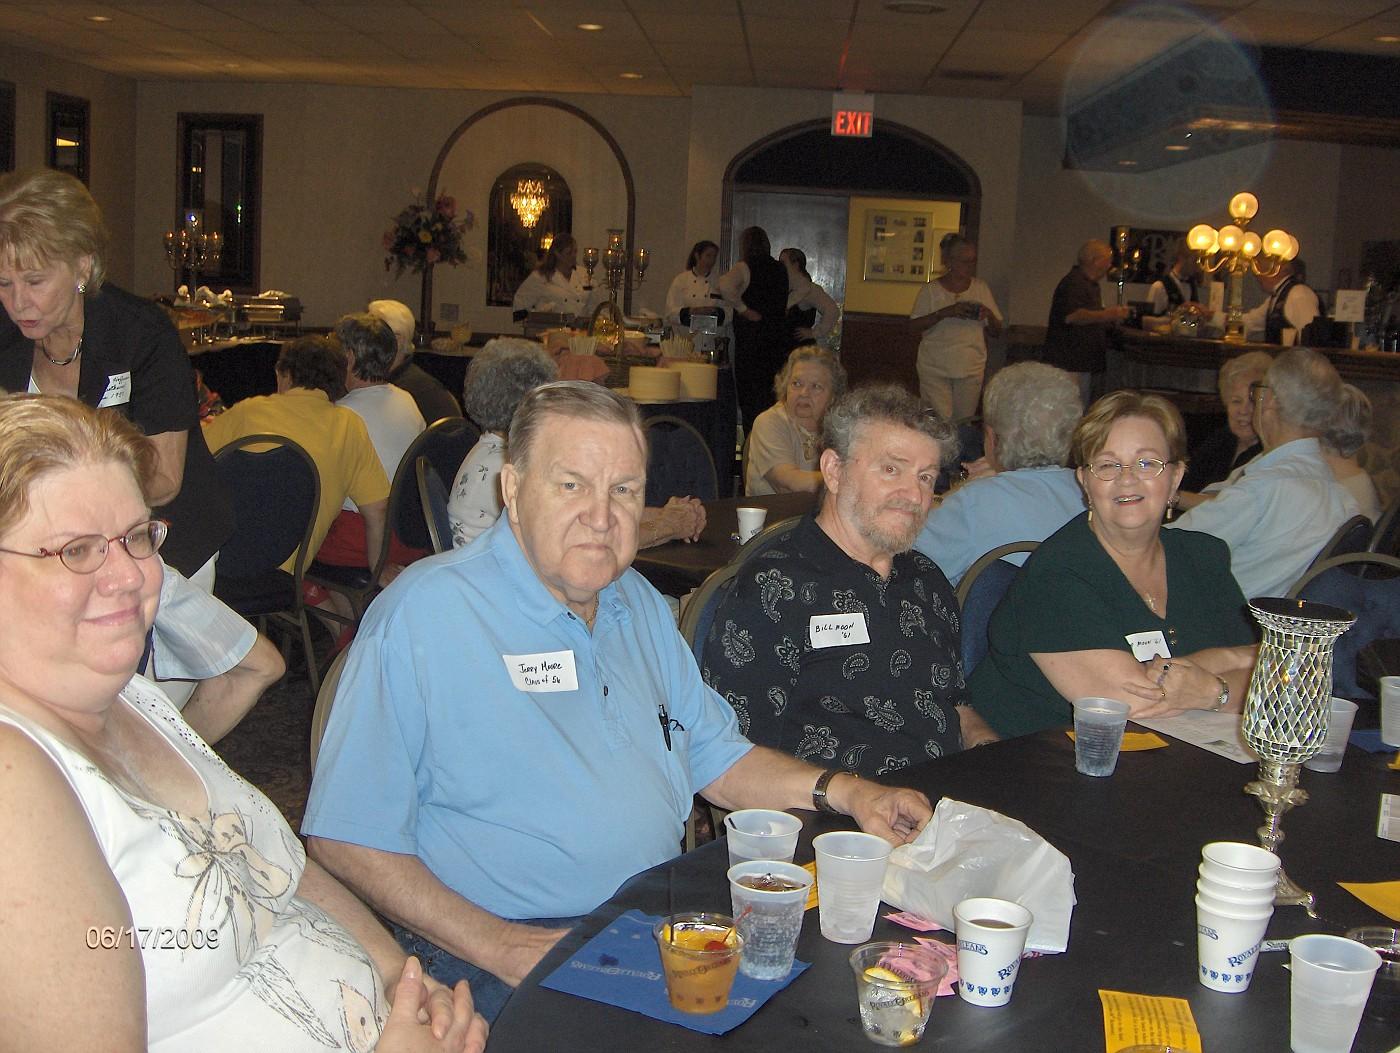 Anita & Jerry Moore, Bill & Bea Moon